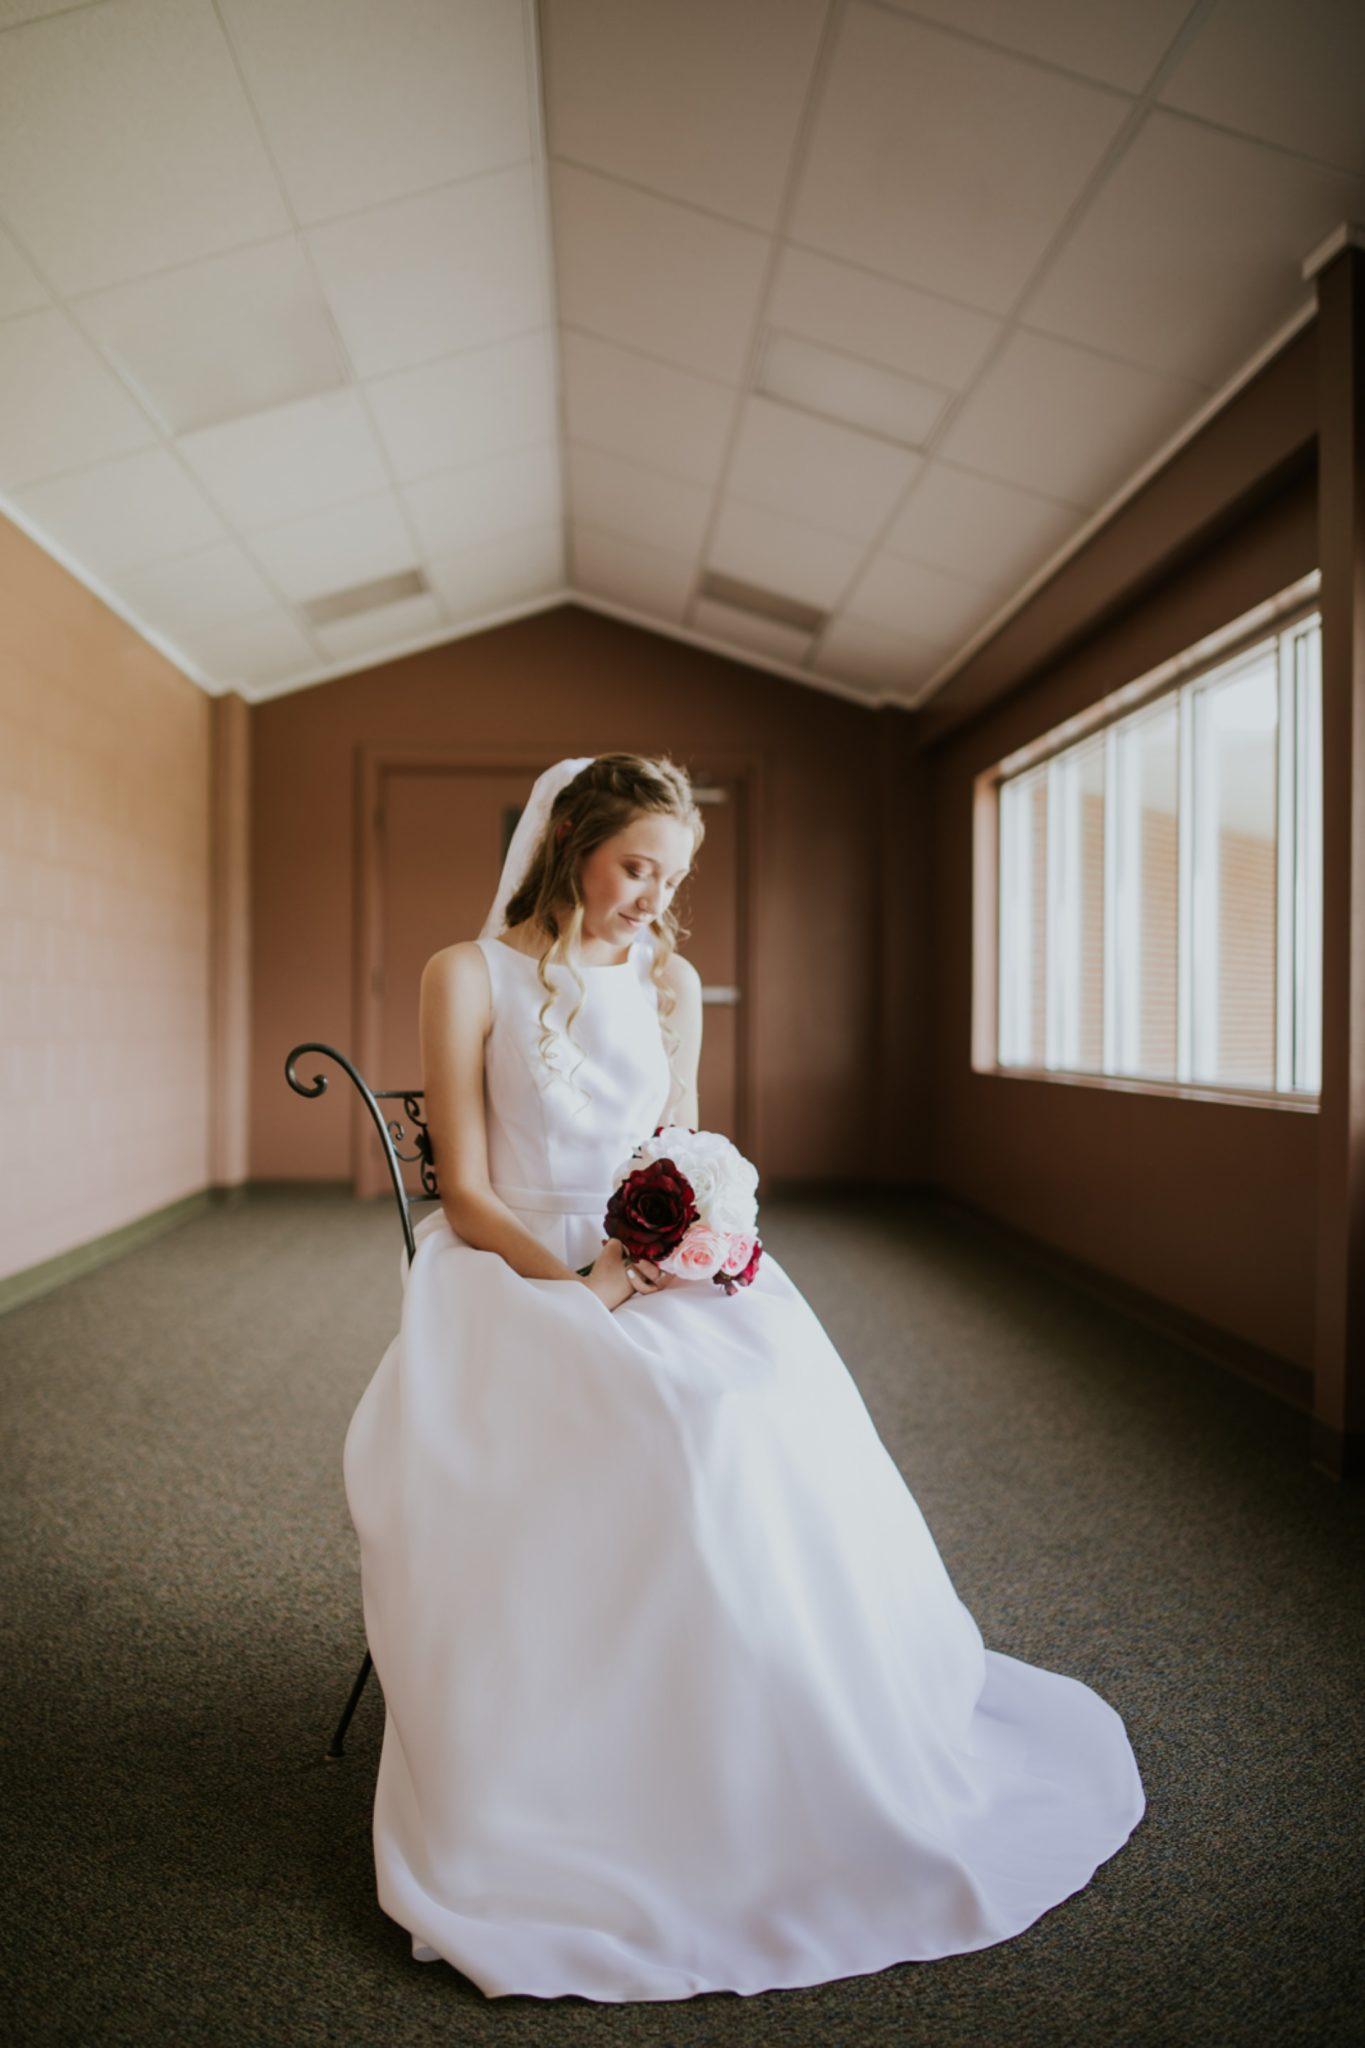 East-Central-Indiana-Wedding_016.jpg